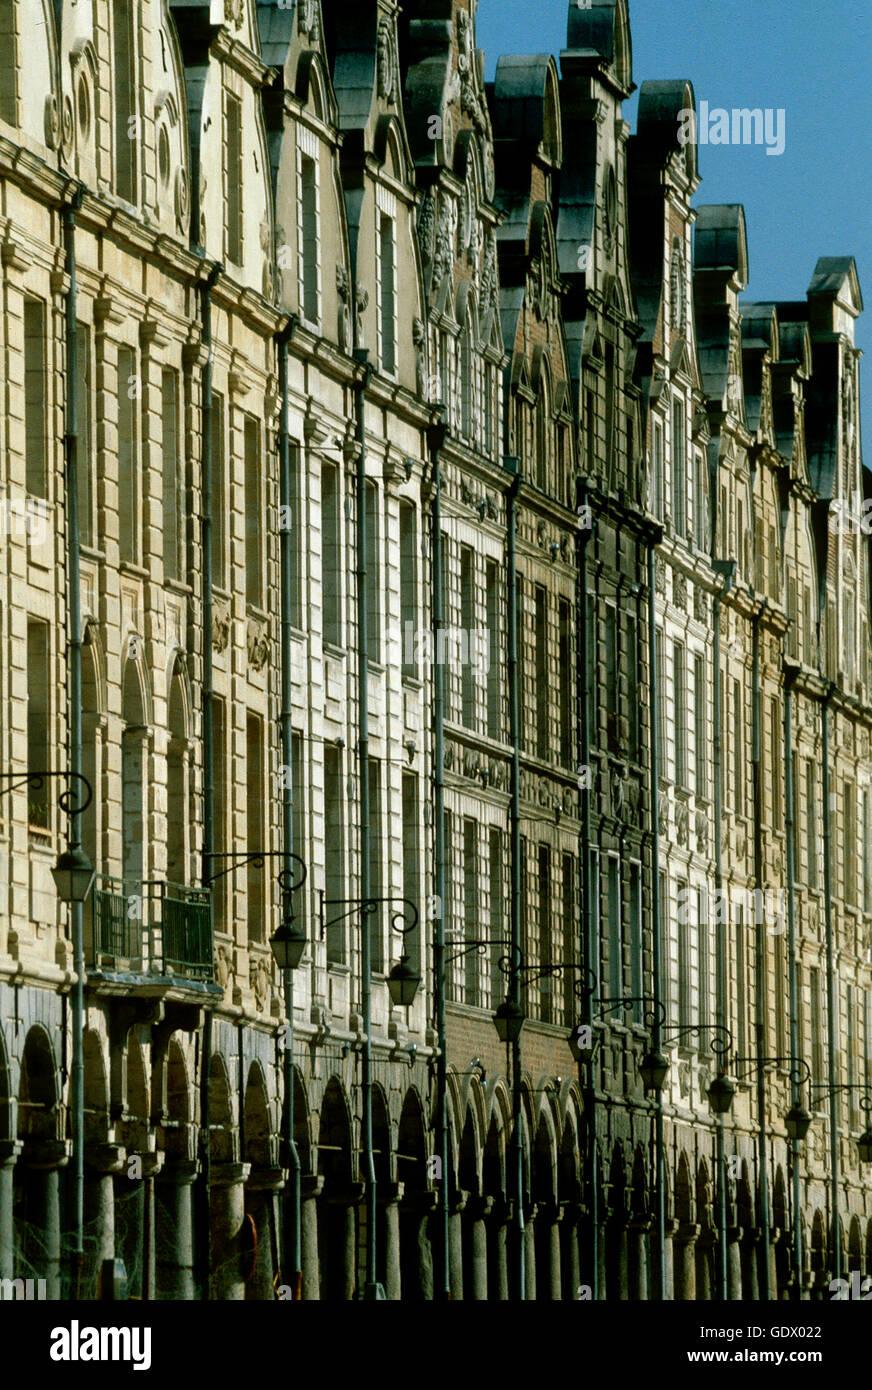 Congress of Arras